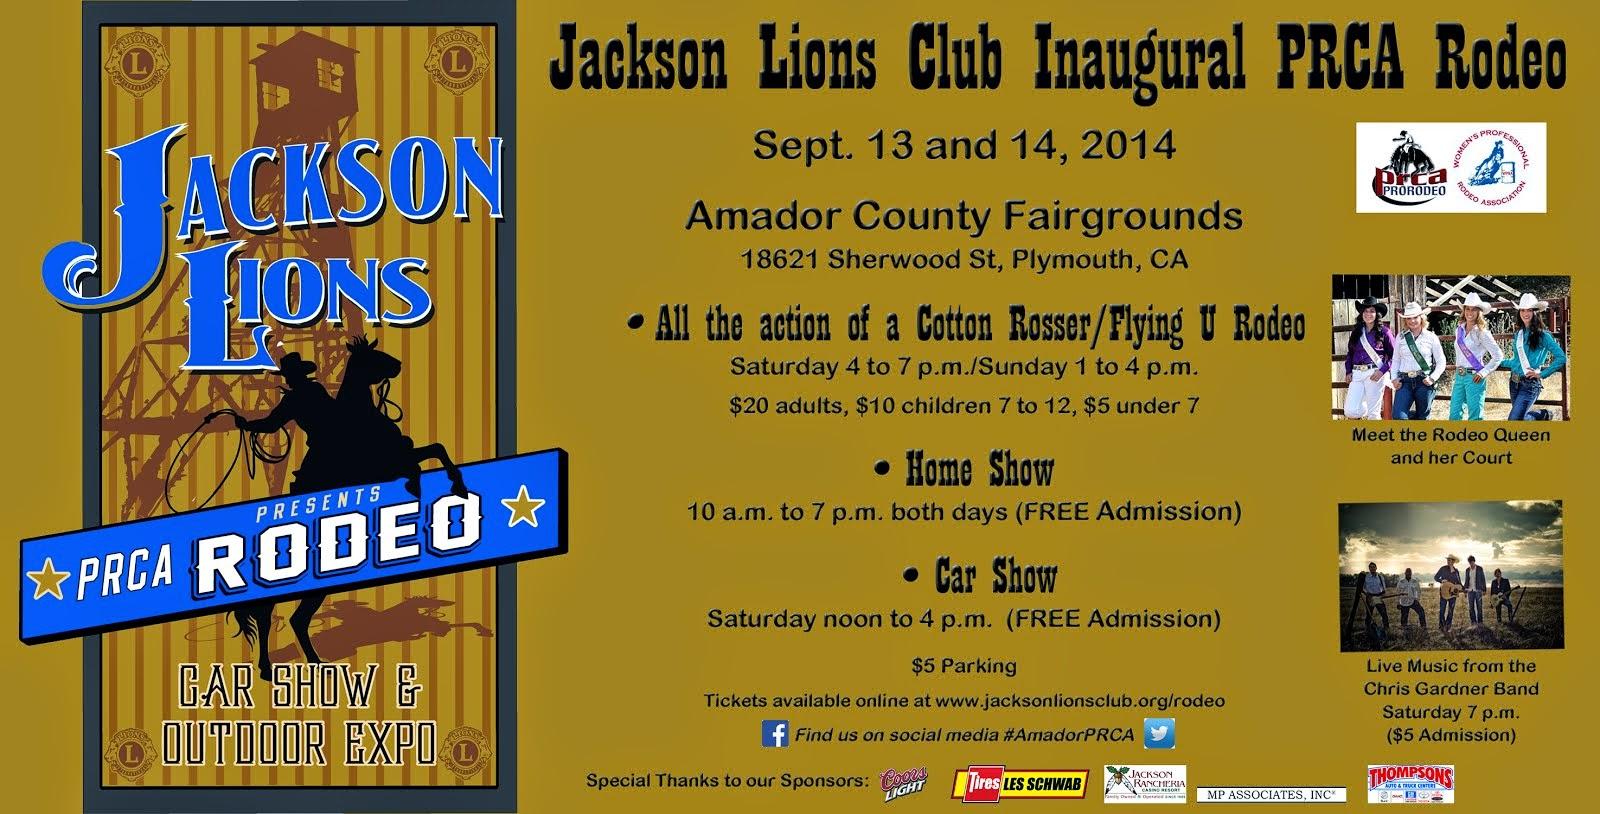 Jackson Lions Club PRCA Rodeo!